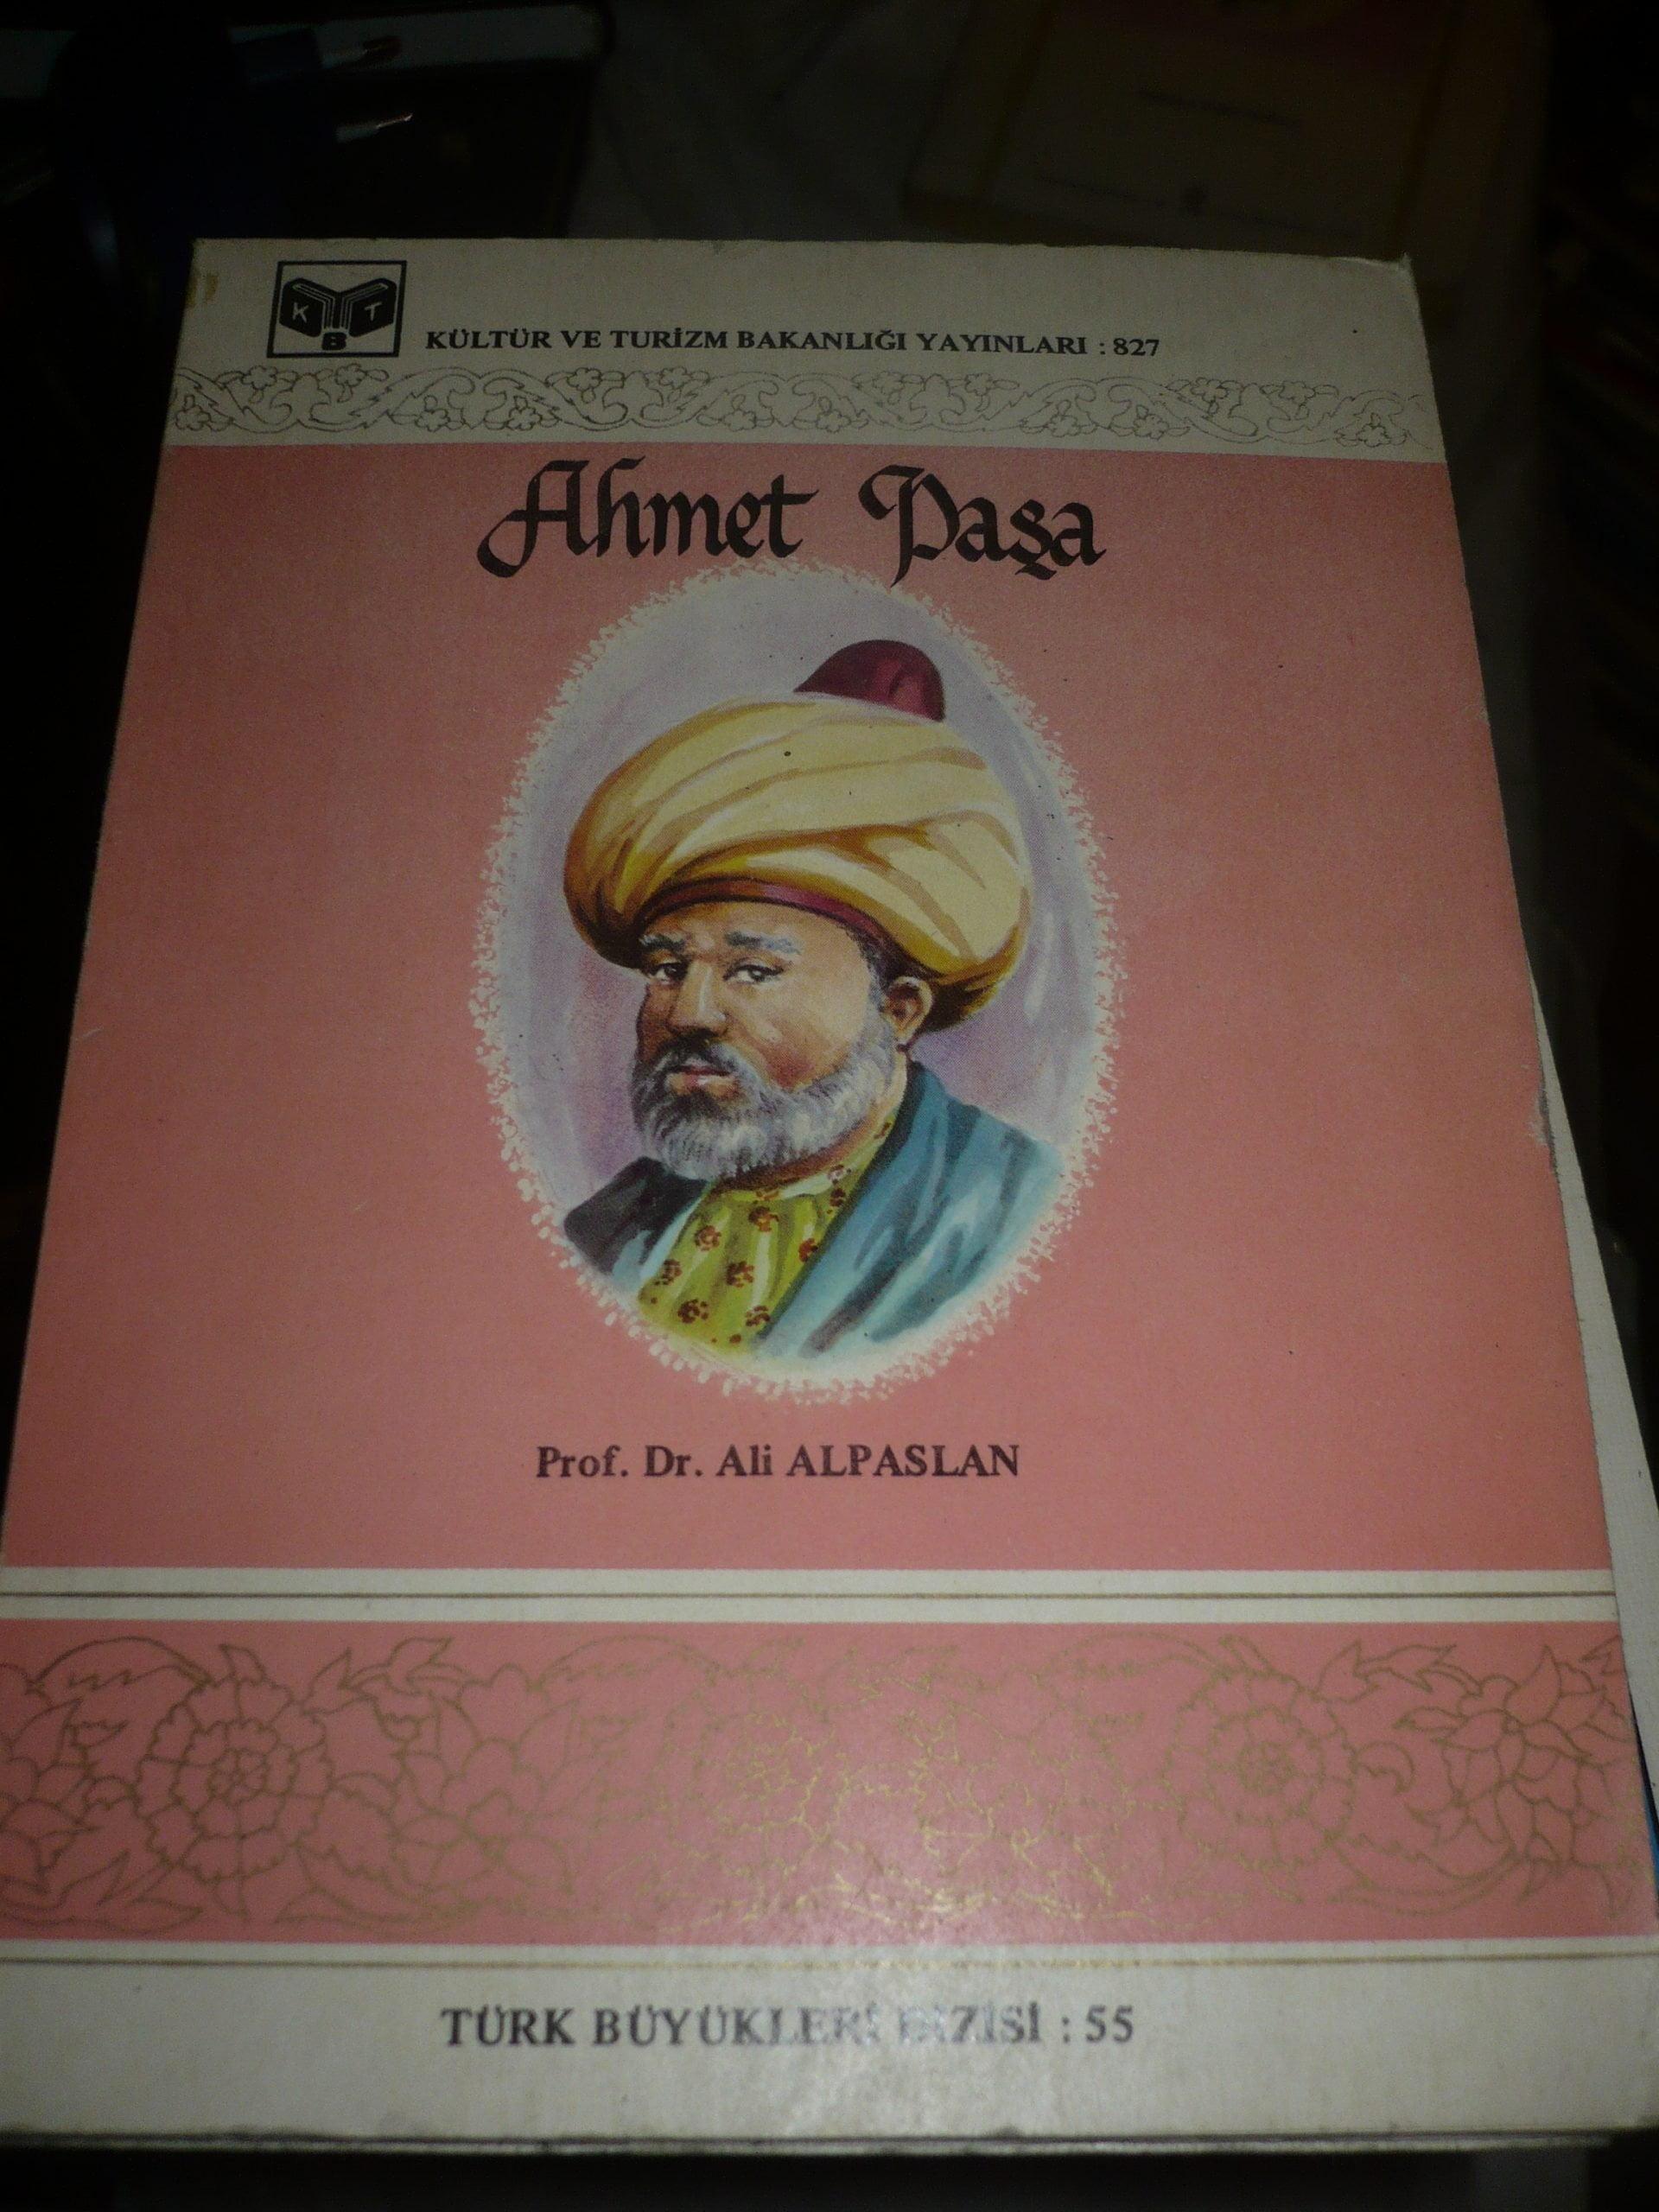 AHMET PAŞA/Ali ALPASLAN/ 10 tl